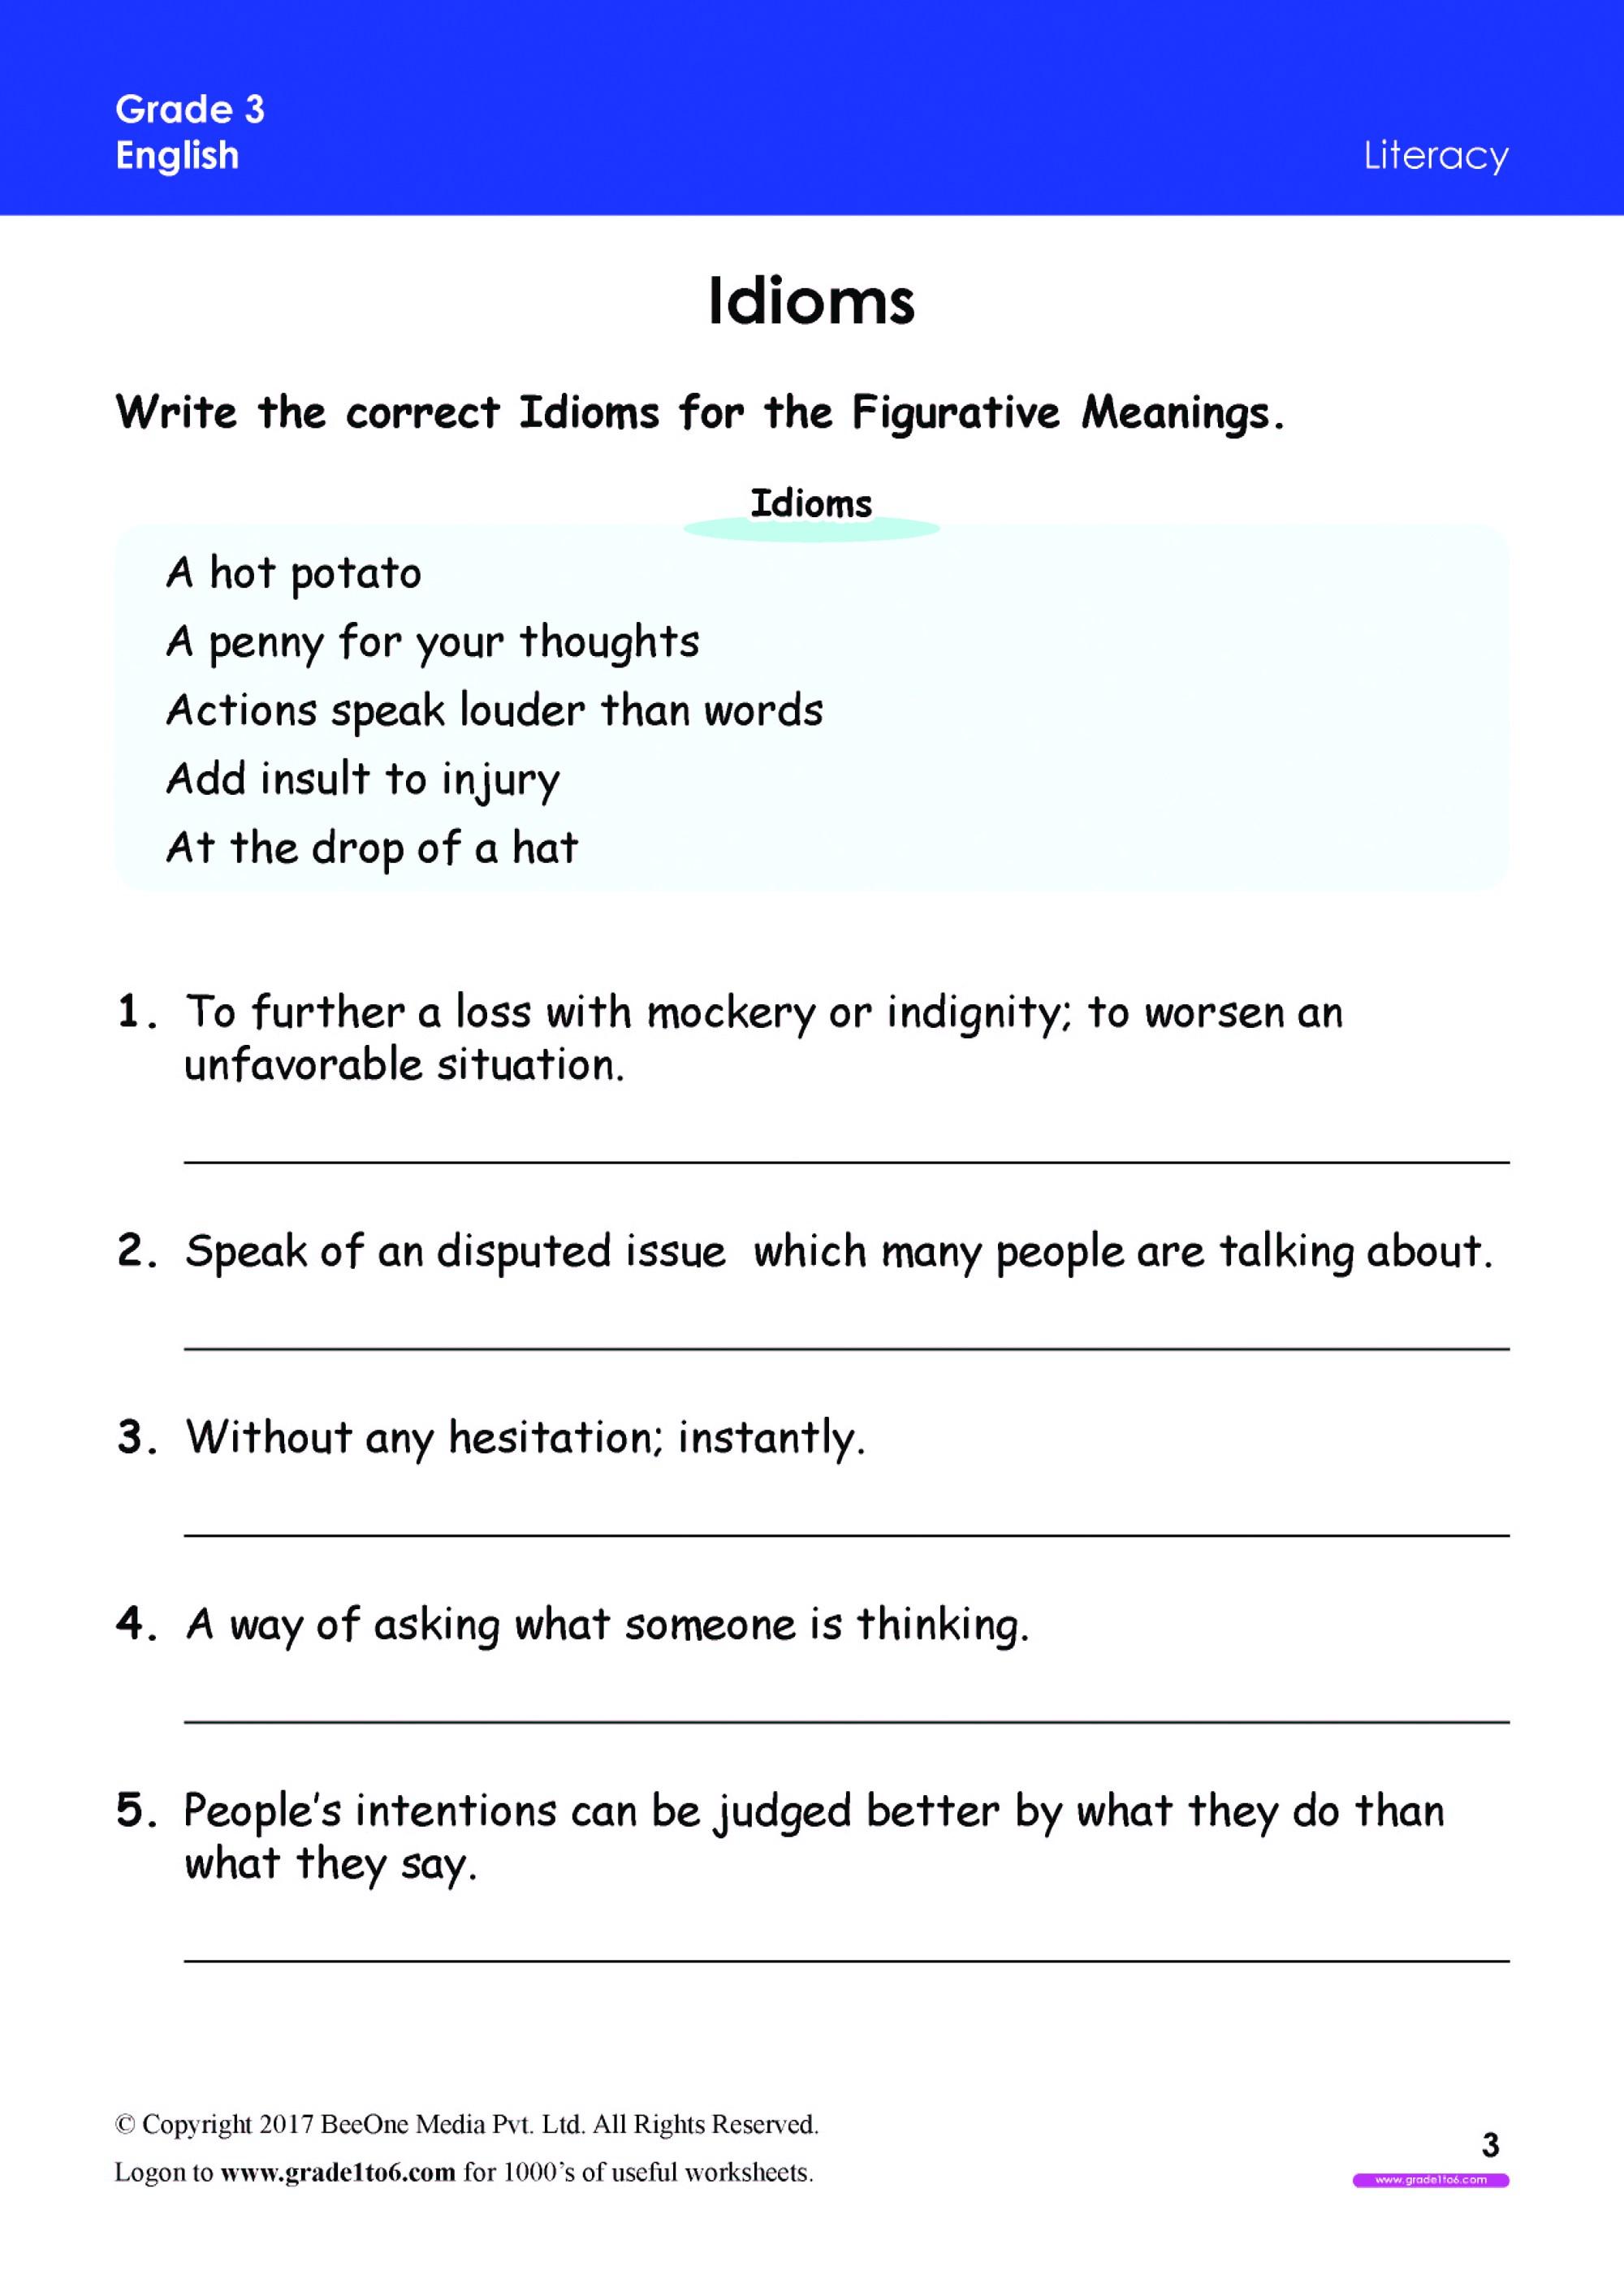 hight resolution of Idioms Worksheet Grade 3 www.grade1to6.com